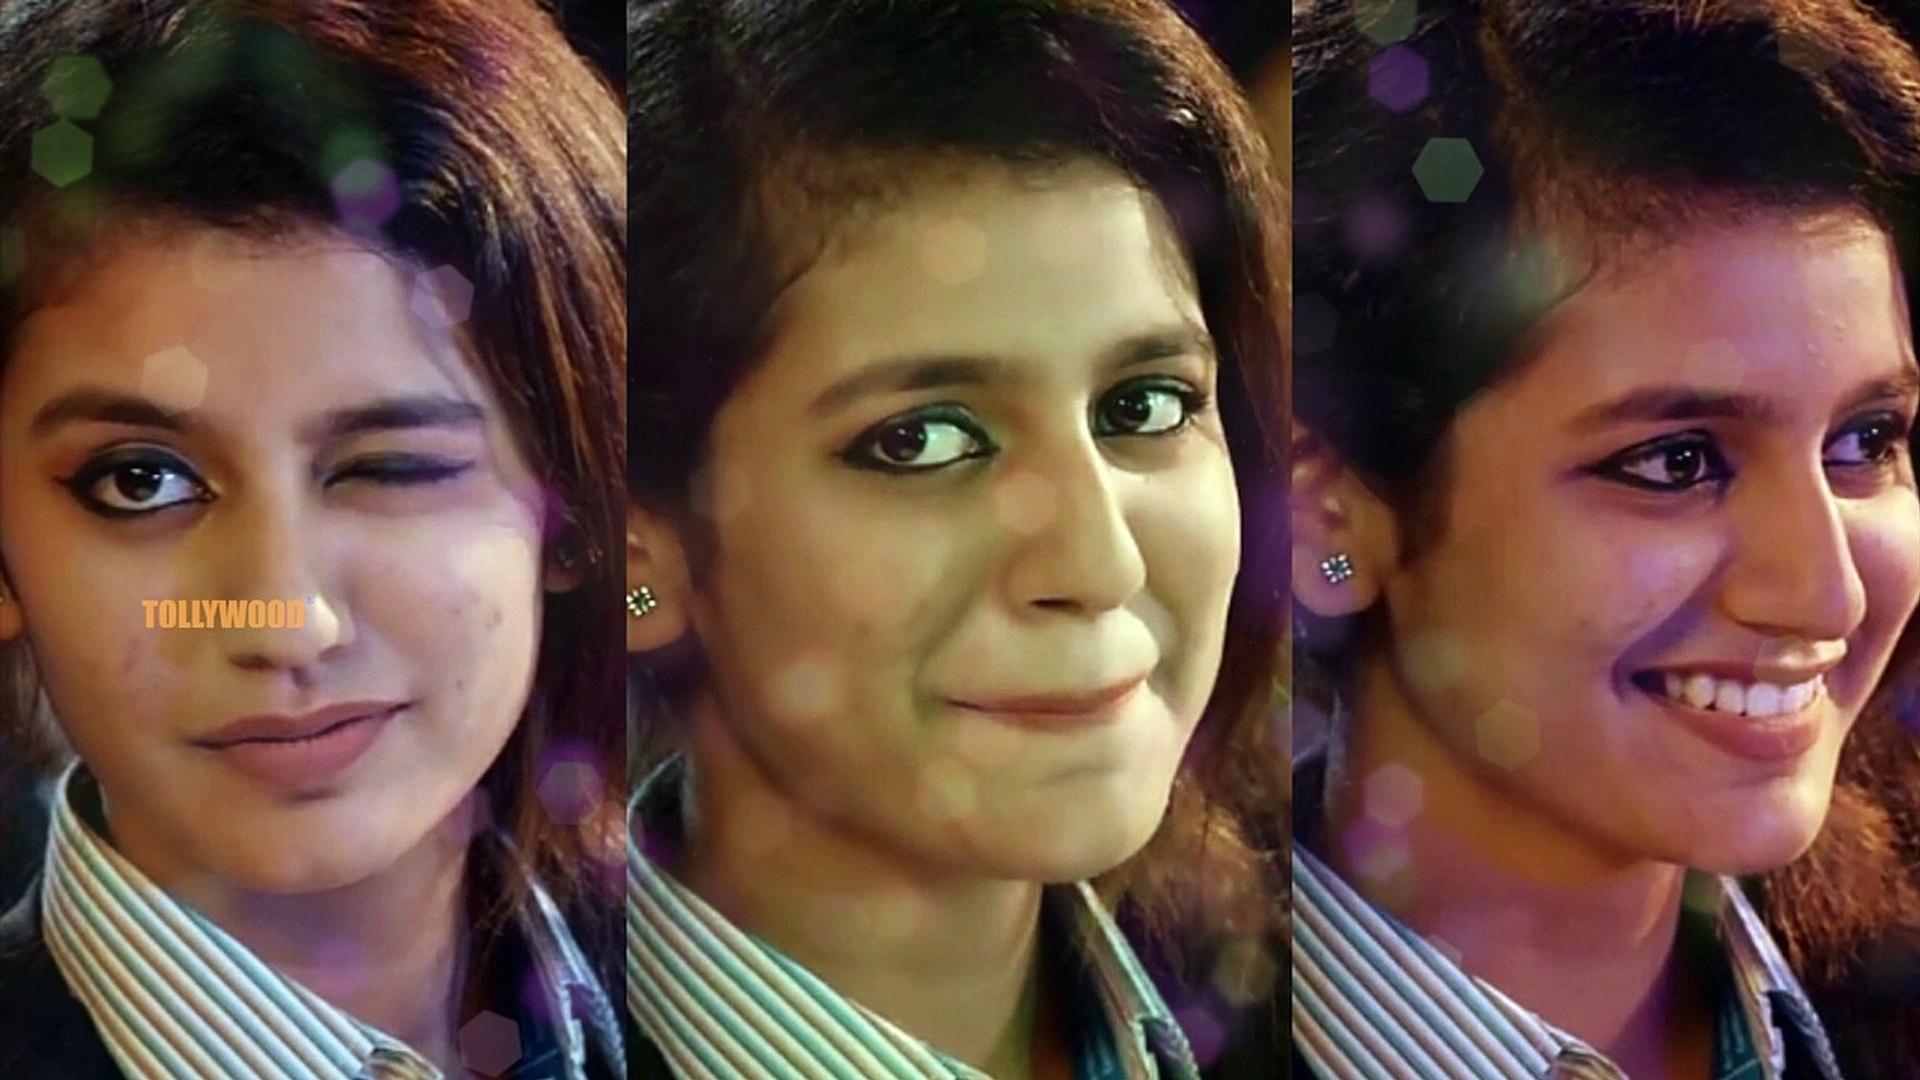 This Time Kiss Gun for Allu Arjun | అల్లు అర్జున్ పై కాల్పులు | Allu Arjun | Priya Prakash Varrier -